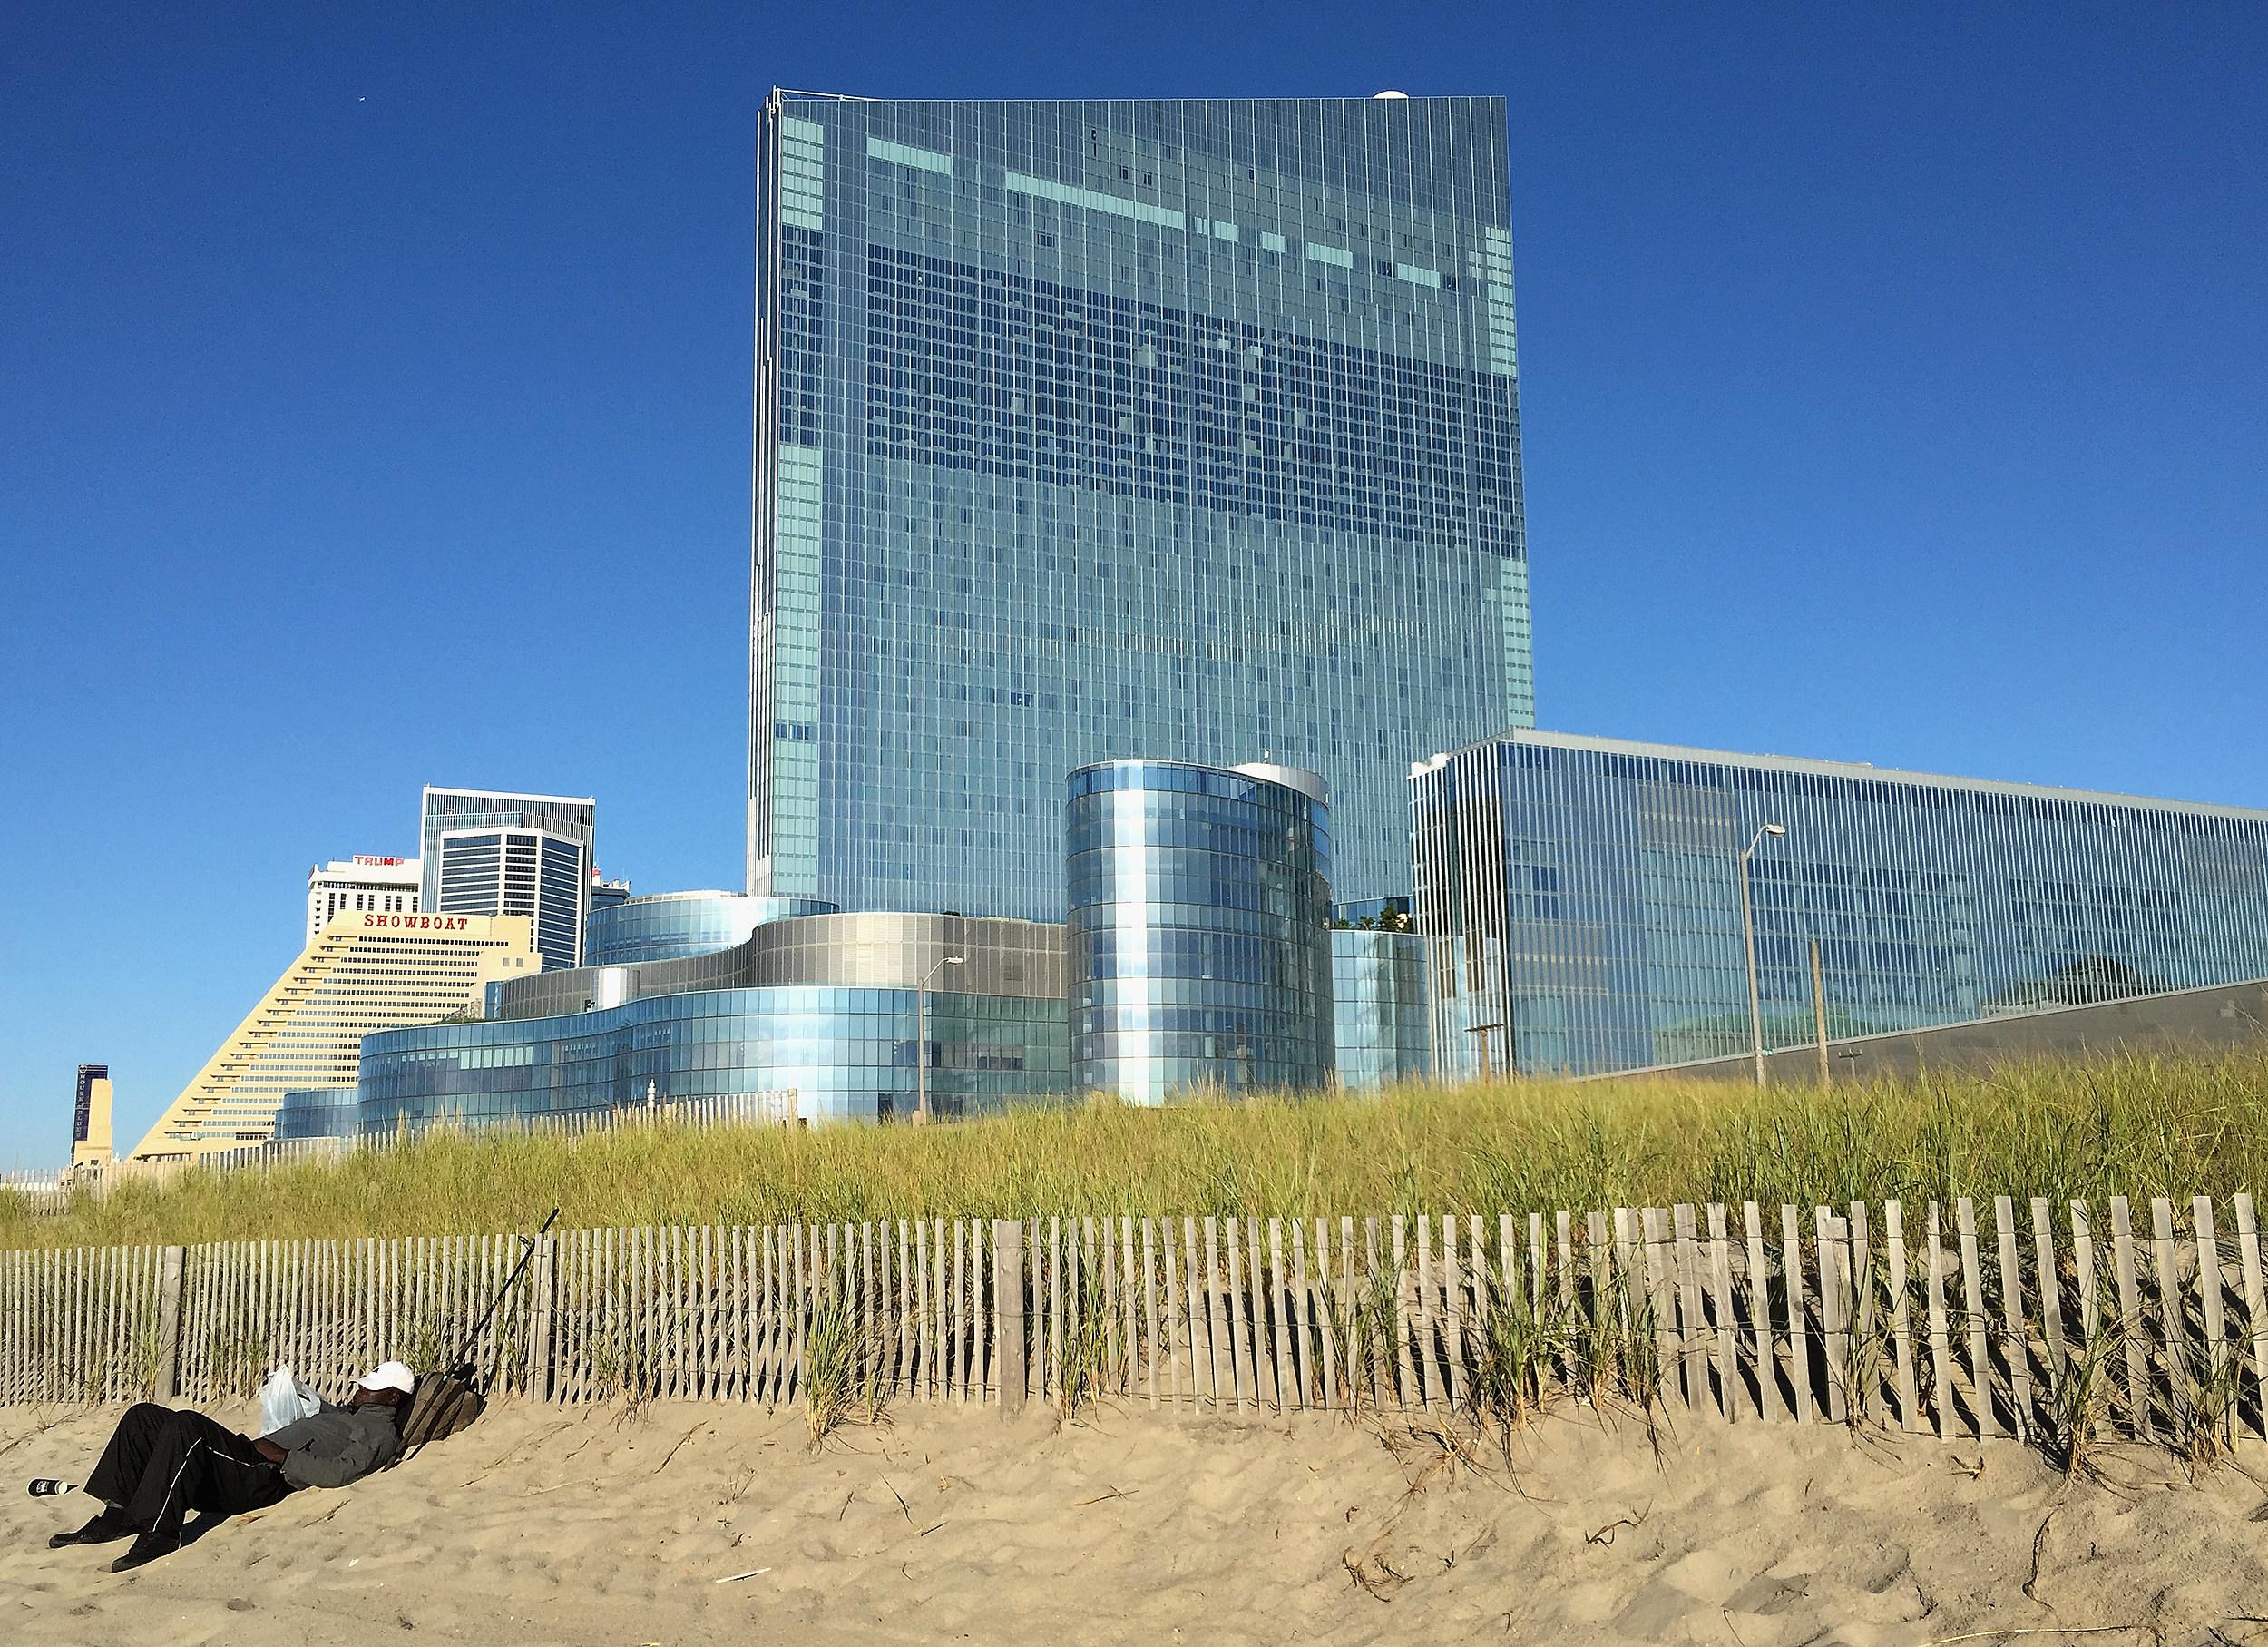 Ocean Resort in AC Reveals Sneak Peak Inside New Casino [VIDEO]